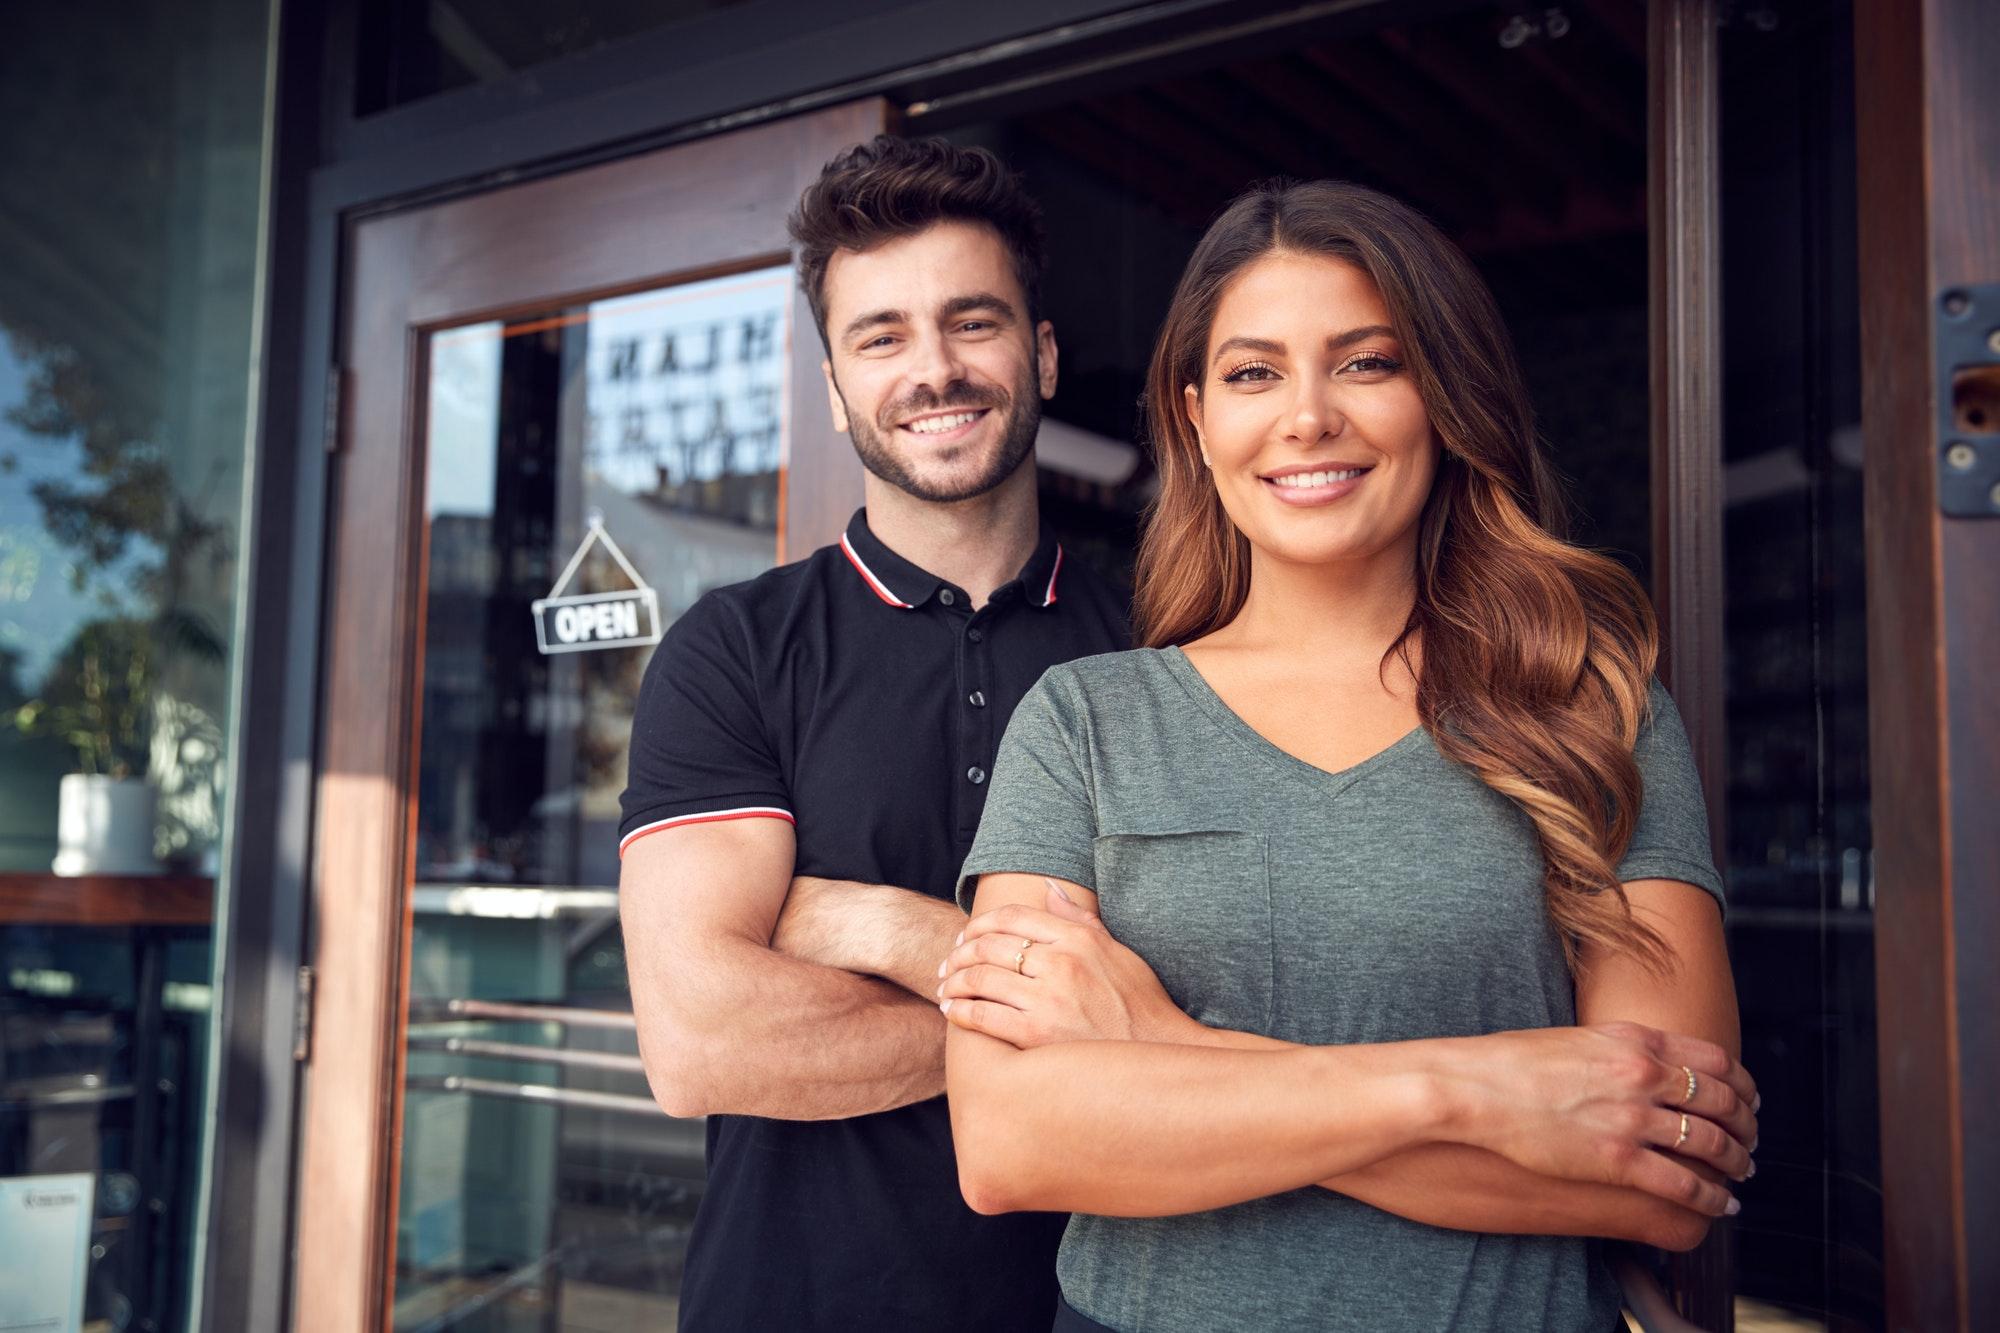 Portrait Of Couple Starting New Coffee Shop Or Restaurant Business Standing In Doorway